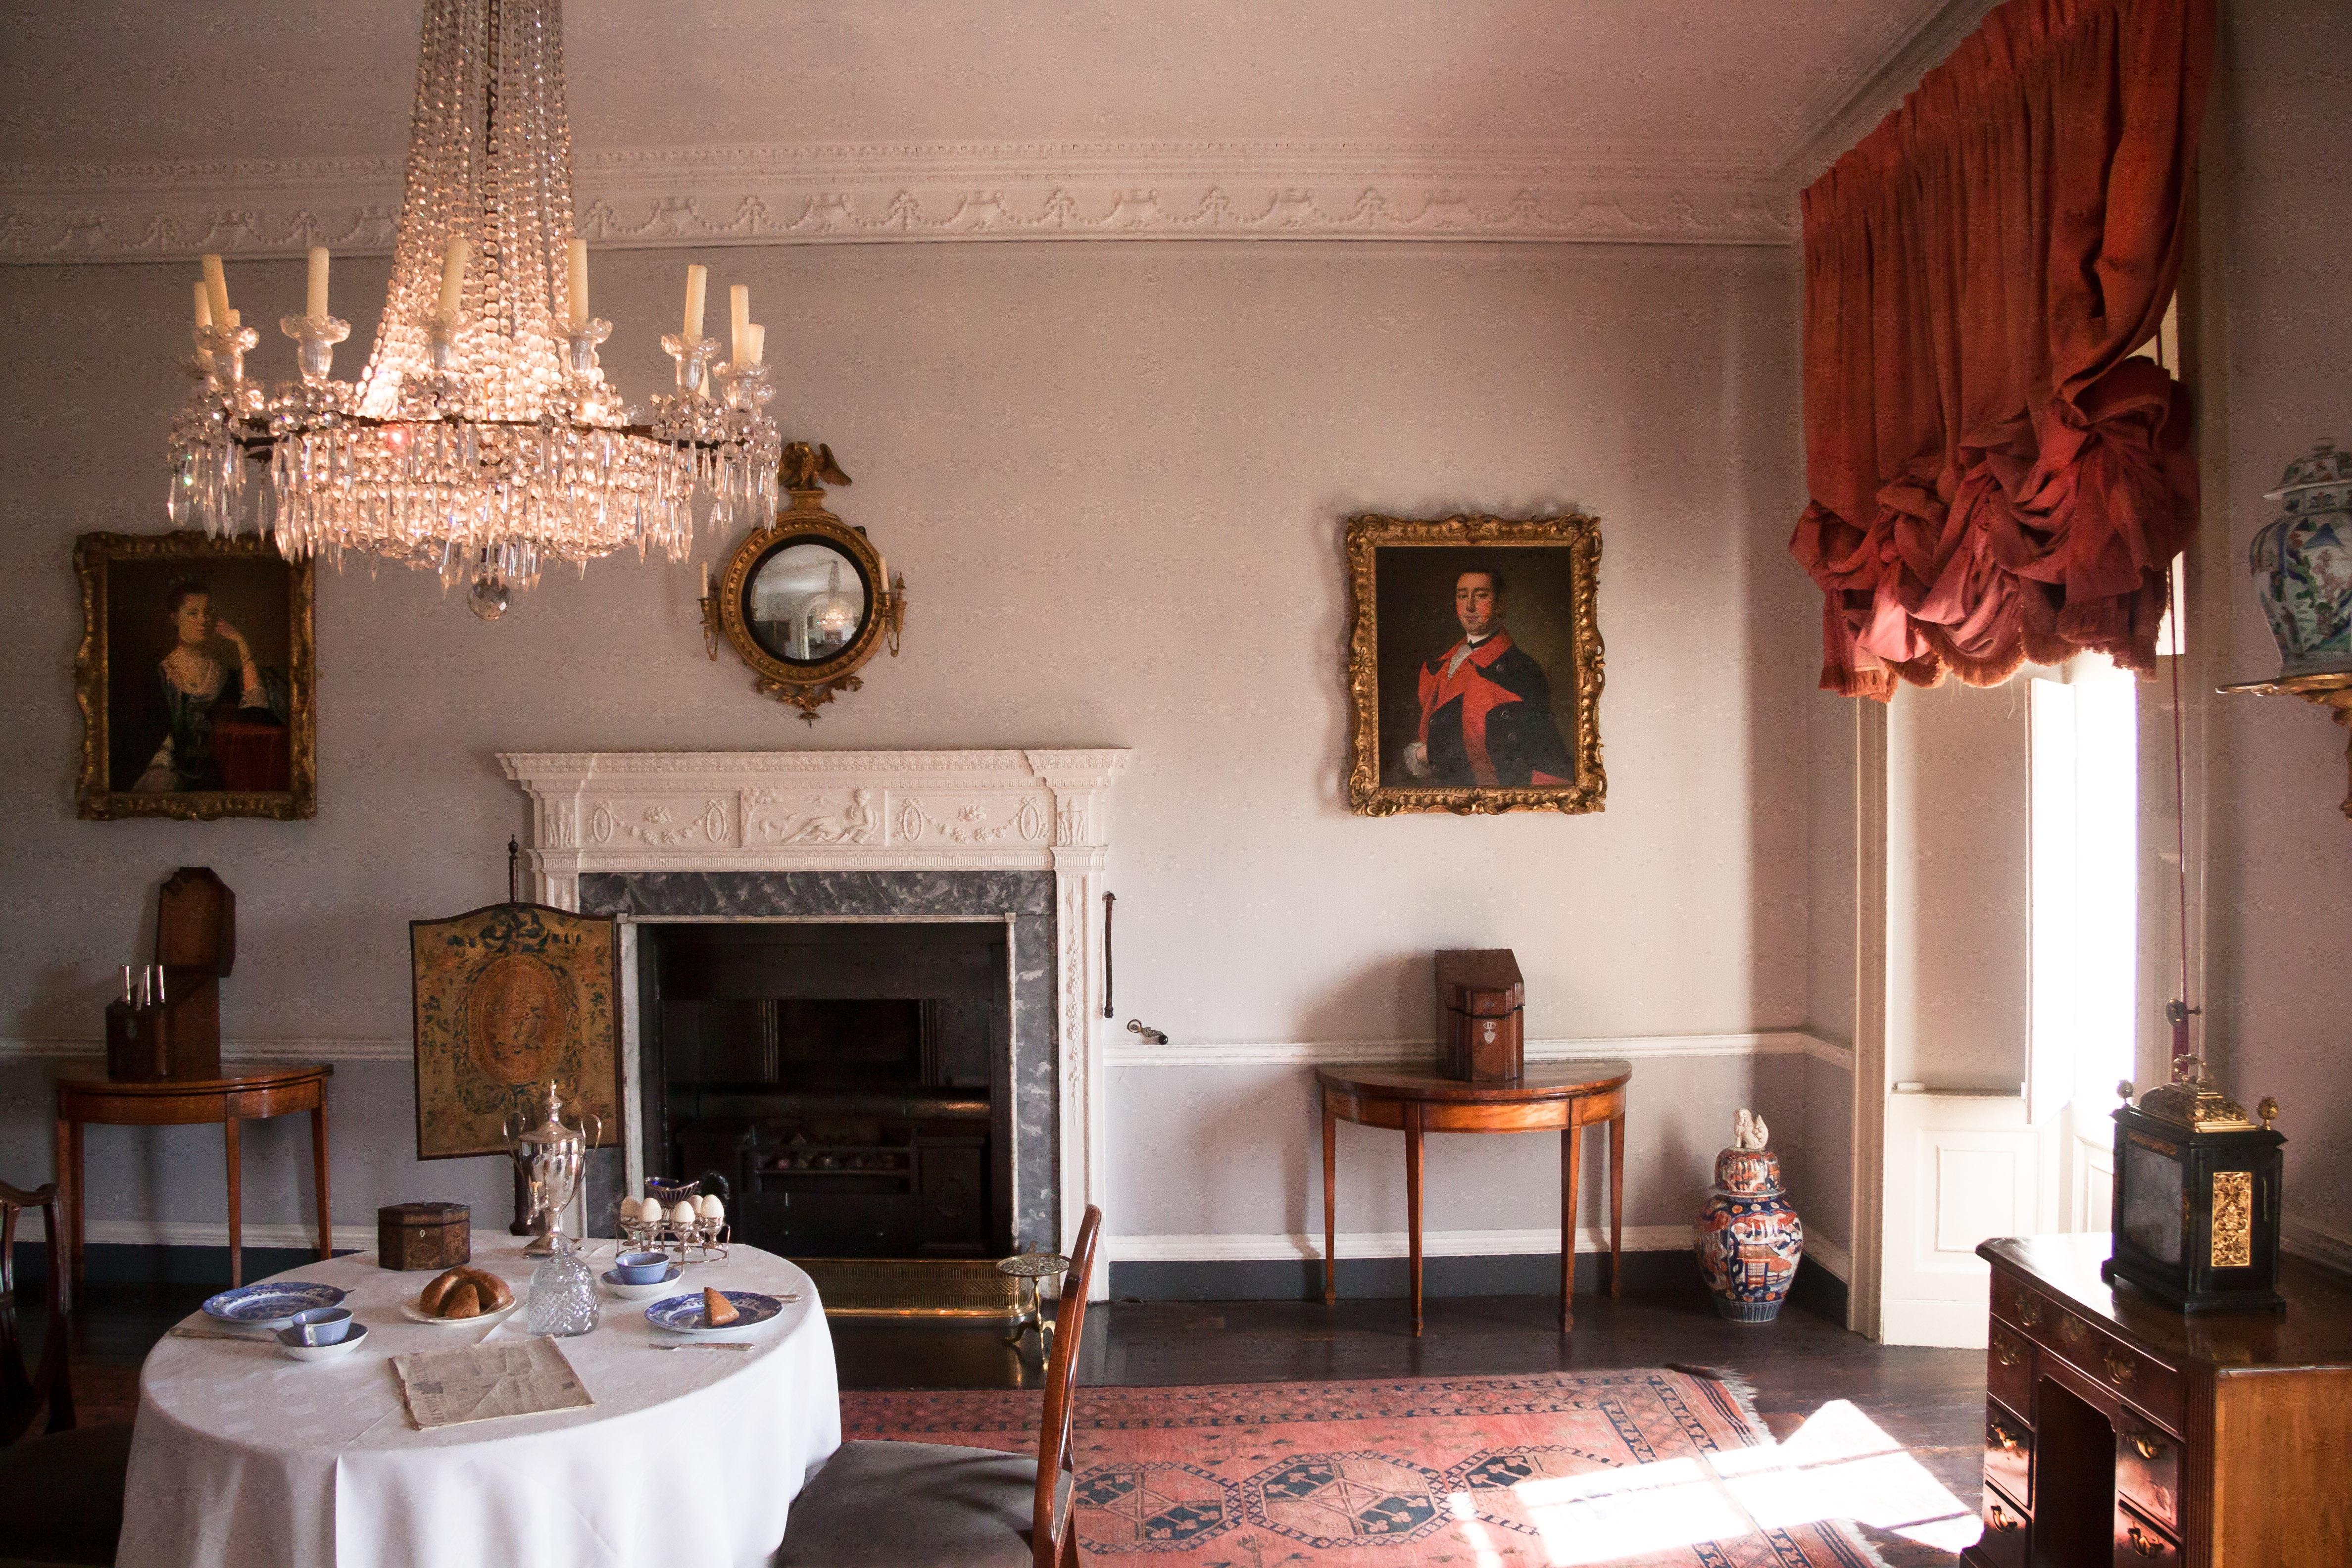 Fotos gratis mesa villa palacio casa edificio - Diseno de pintura para interiores ...